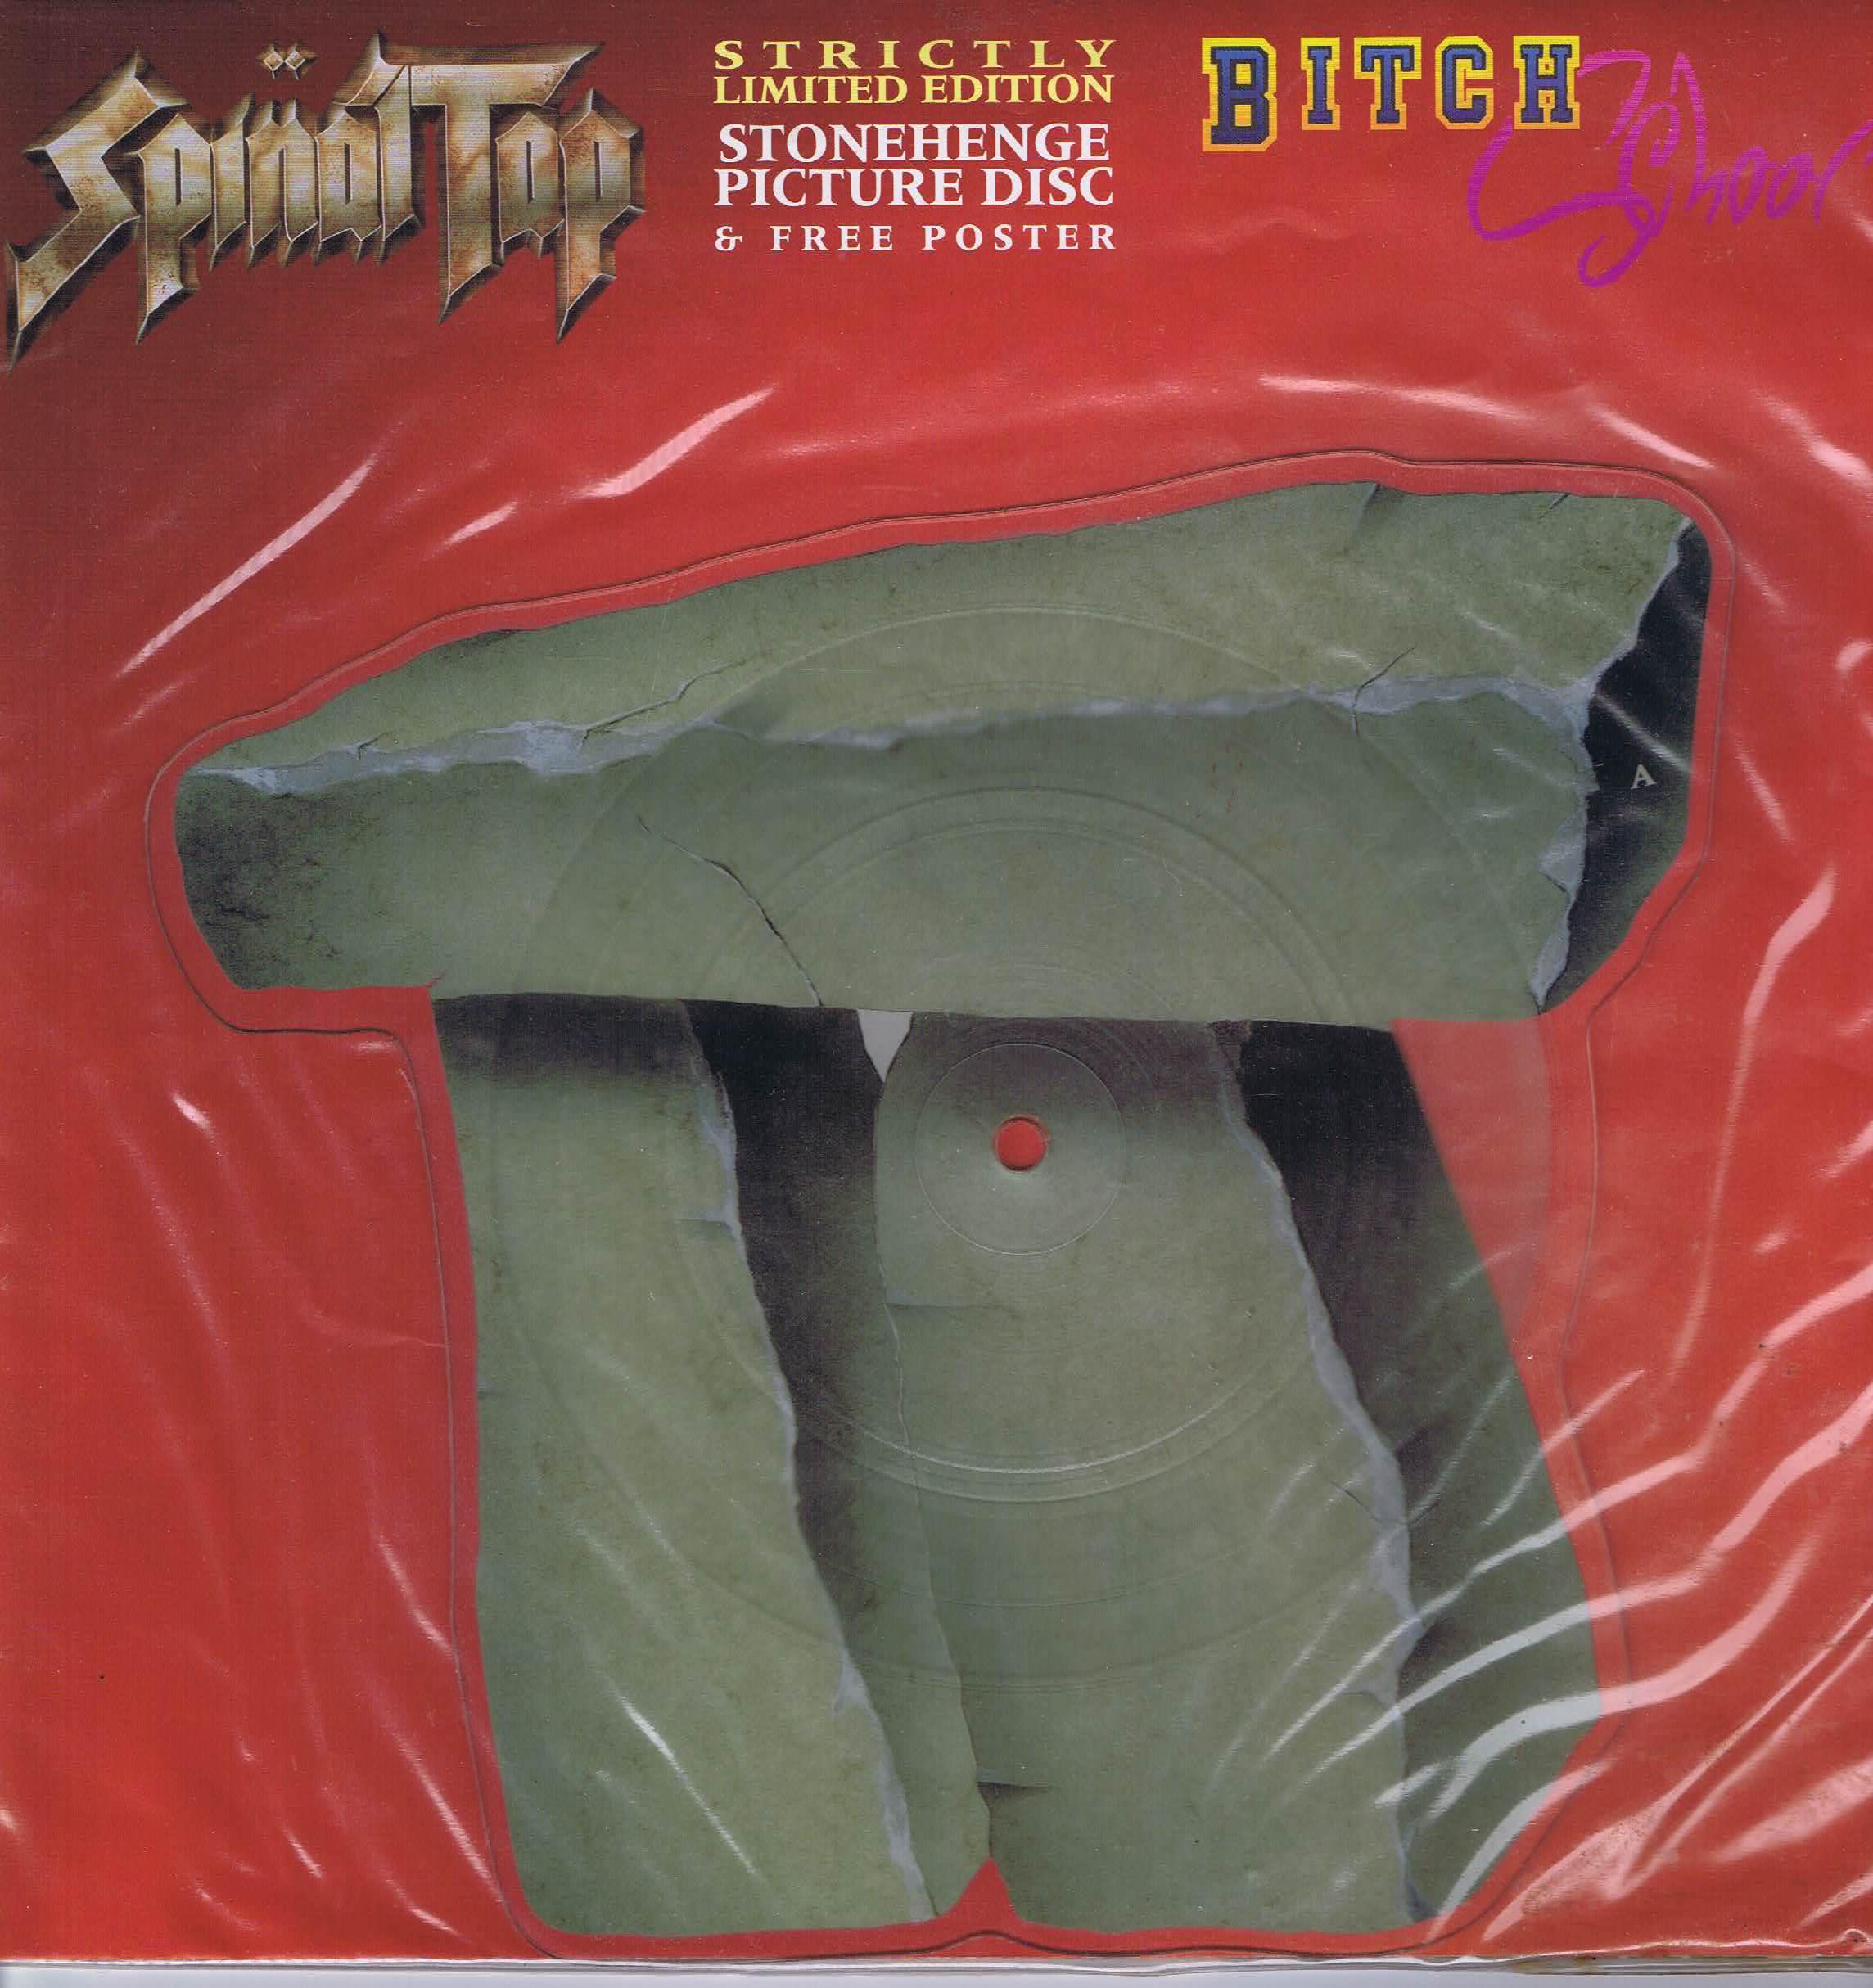 Spinal Tap Bitch School 7 Inch Stonehenge Shaped Vinyl